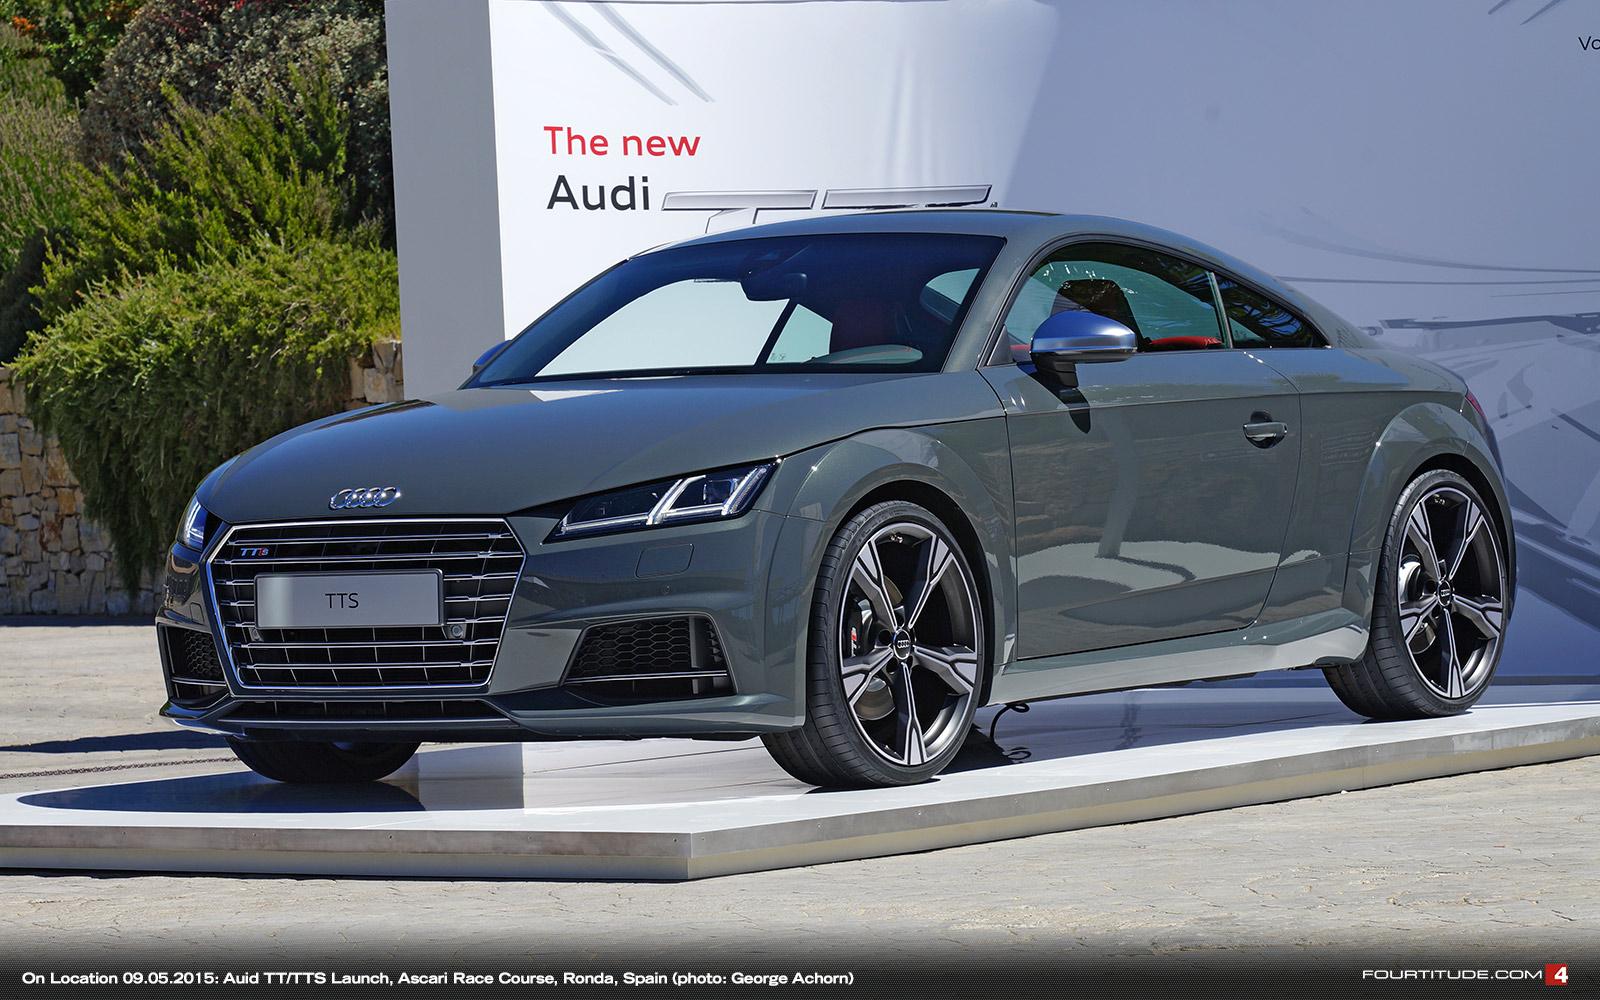 2015 Audi TT Coupe furthermore 2016 Audi TT Grey Nano likewise Audi A1 ...